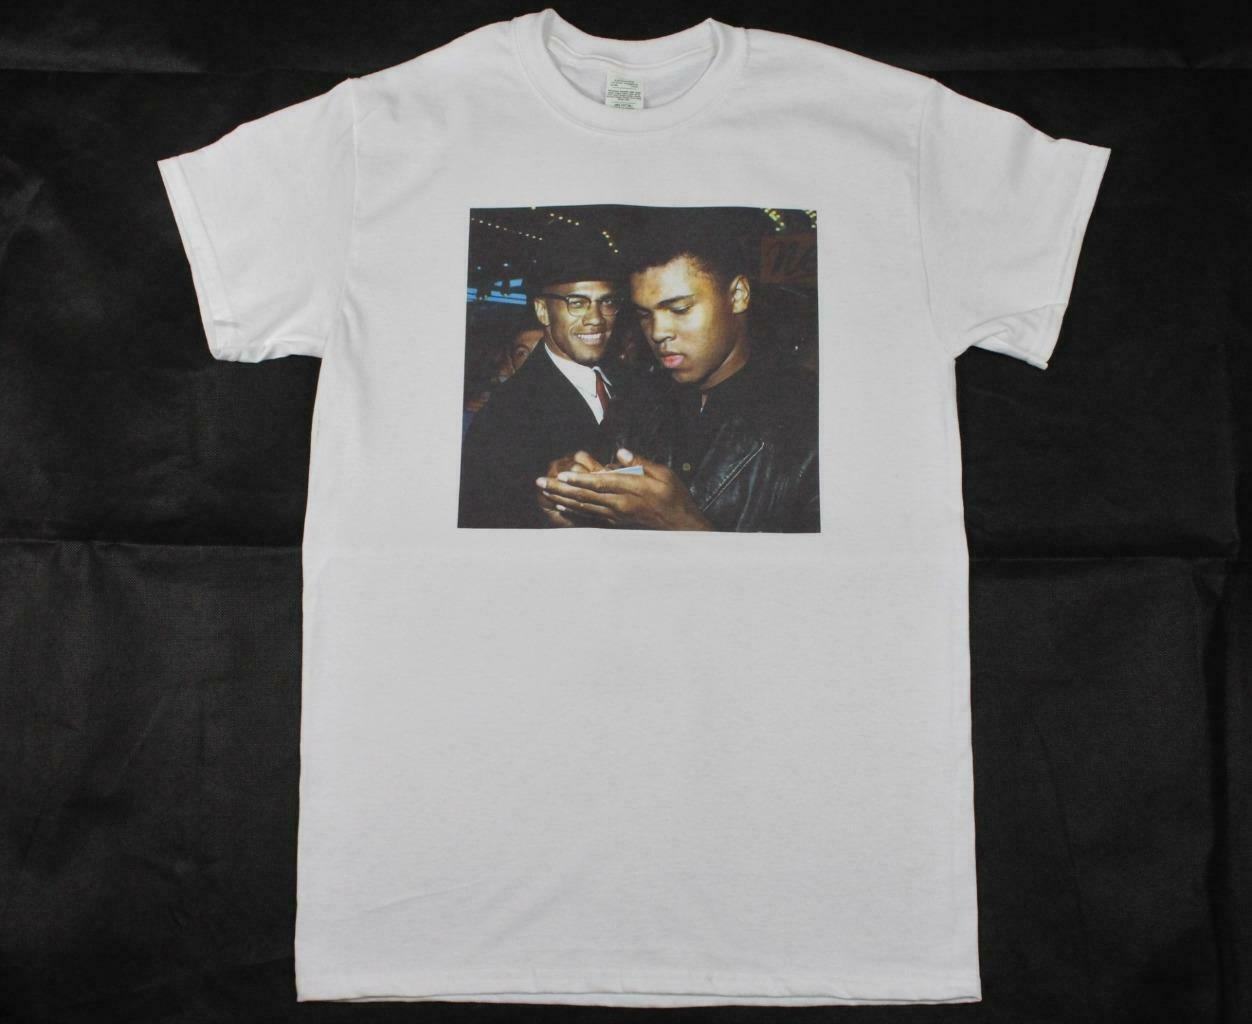 T-shirt Malcolm X mohammad Ali S Xxxl, Droits urbains, Boxe, Mlk Blm, Vintage